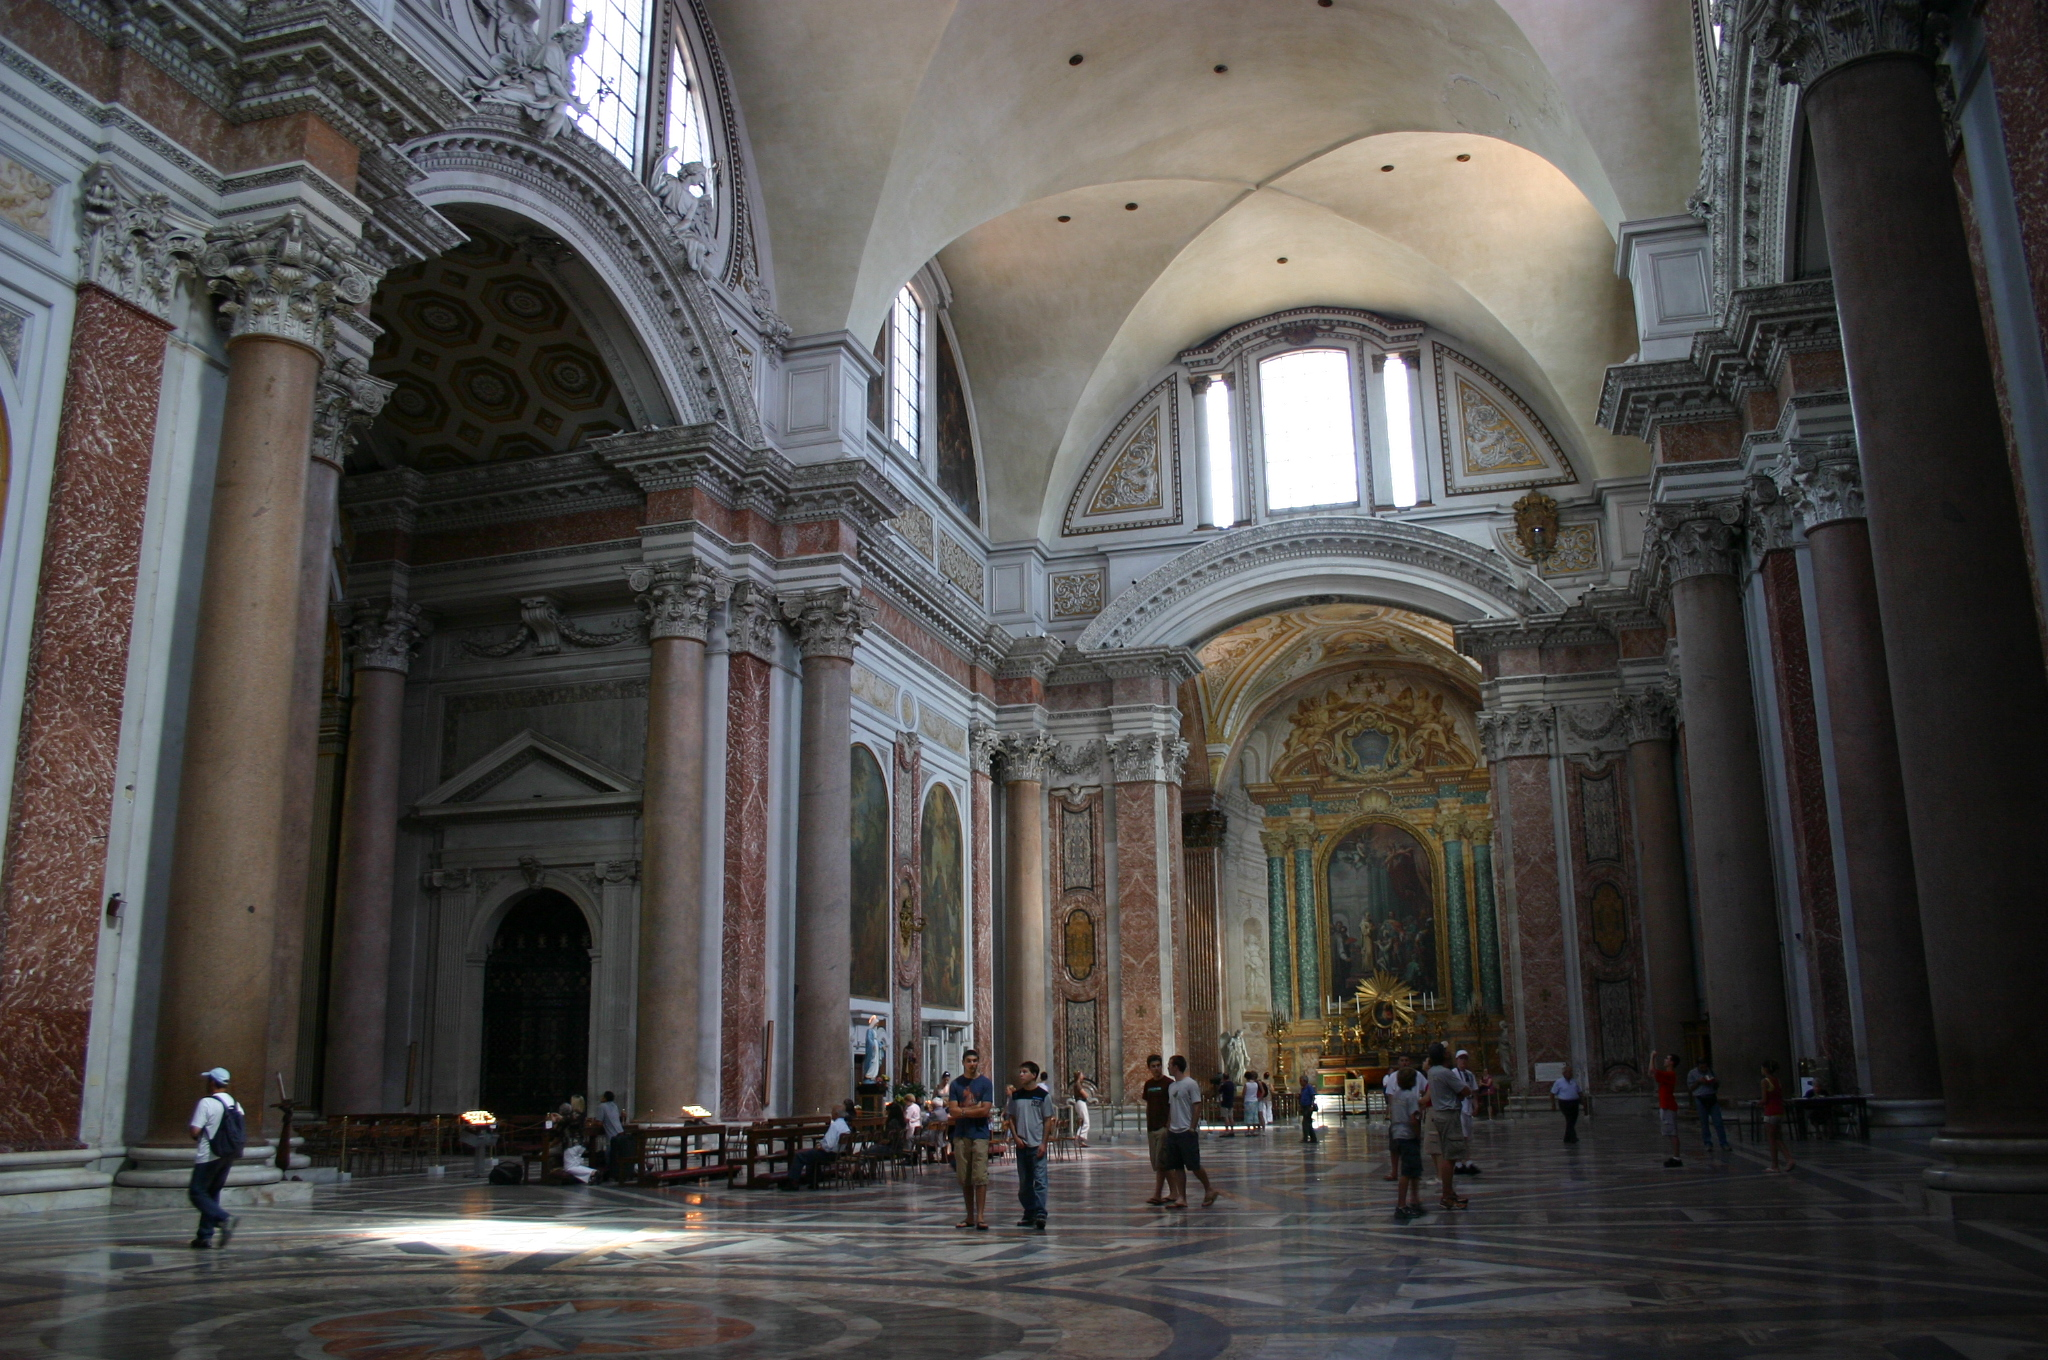 Michelangelo Santa Maria degli Angeli